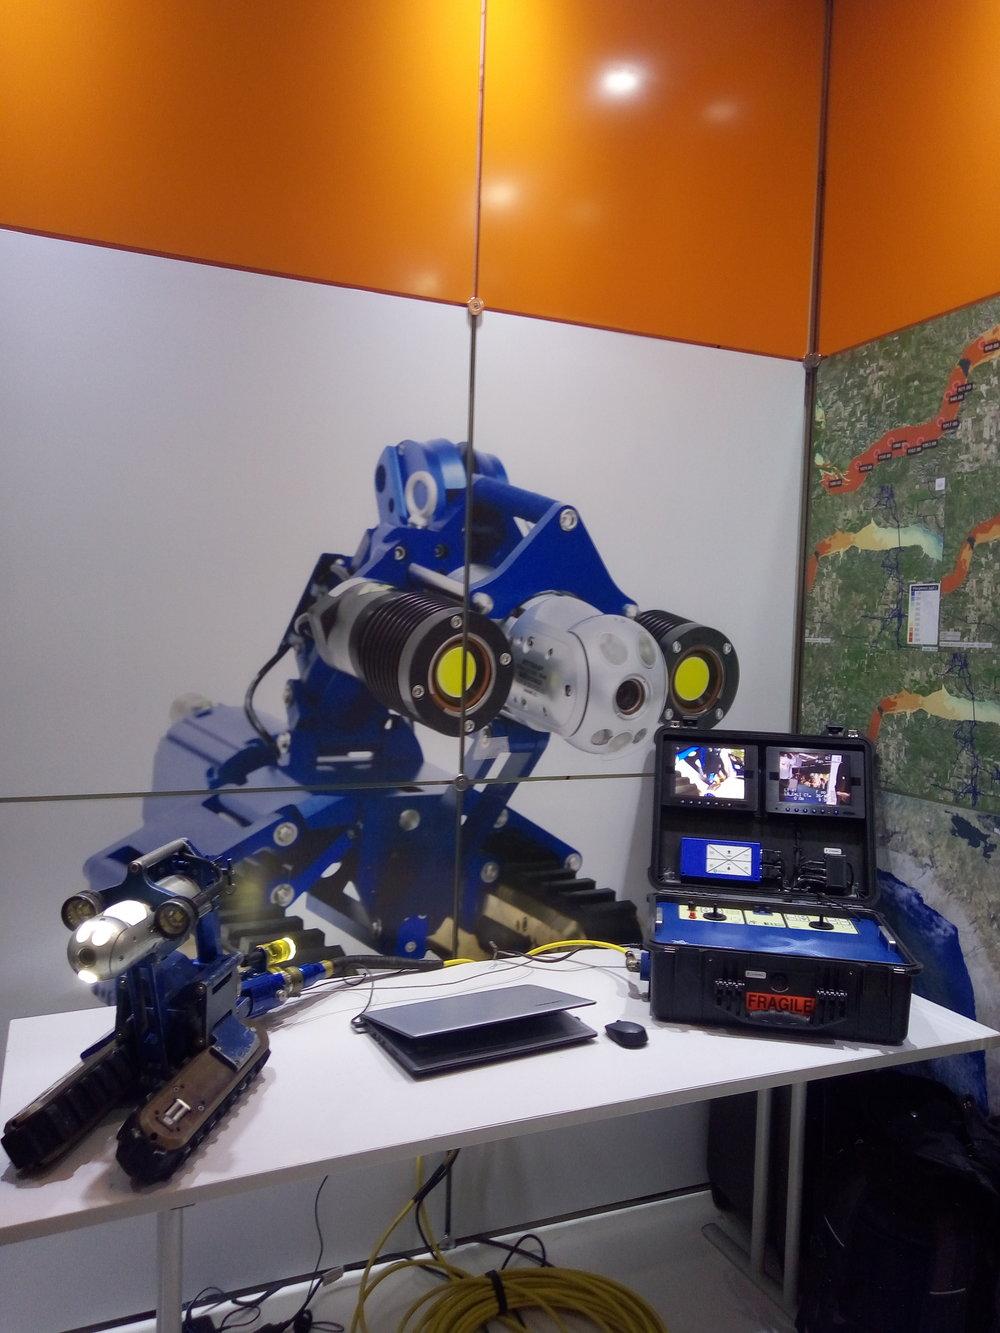 Inuktun Versatrax 150™ Crawler